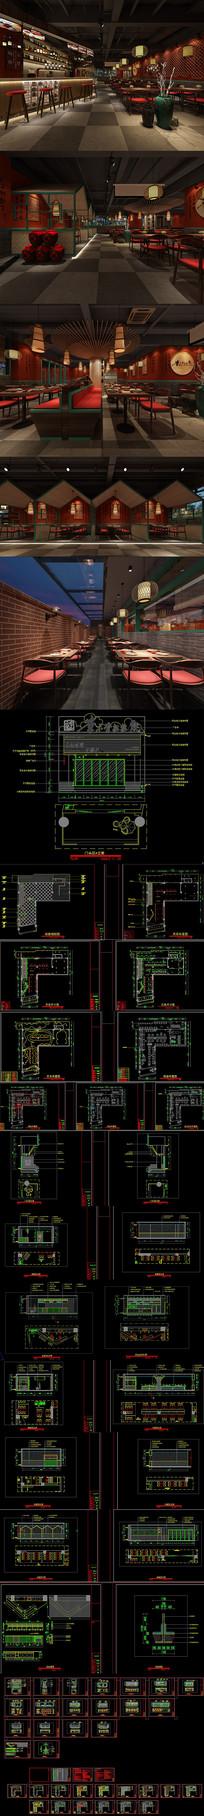 全套烧烤店CAD施工图 效果图